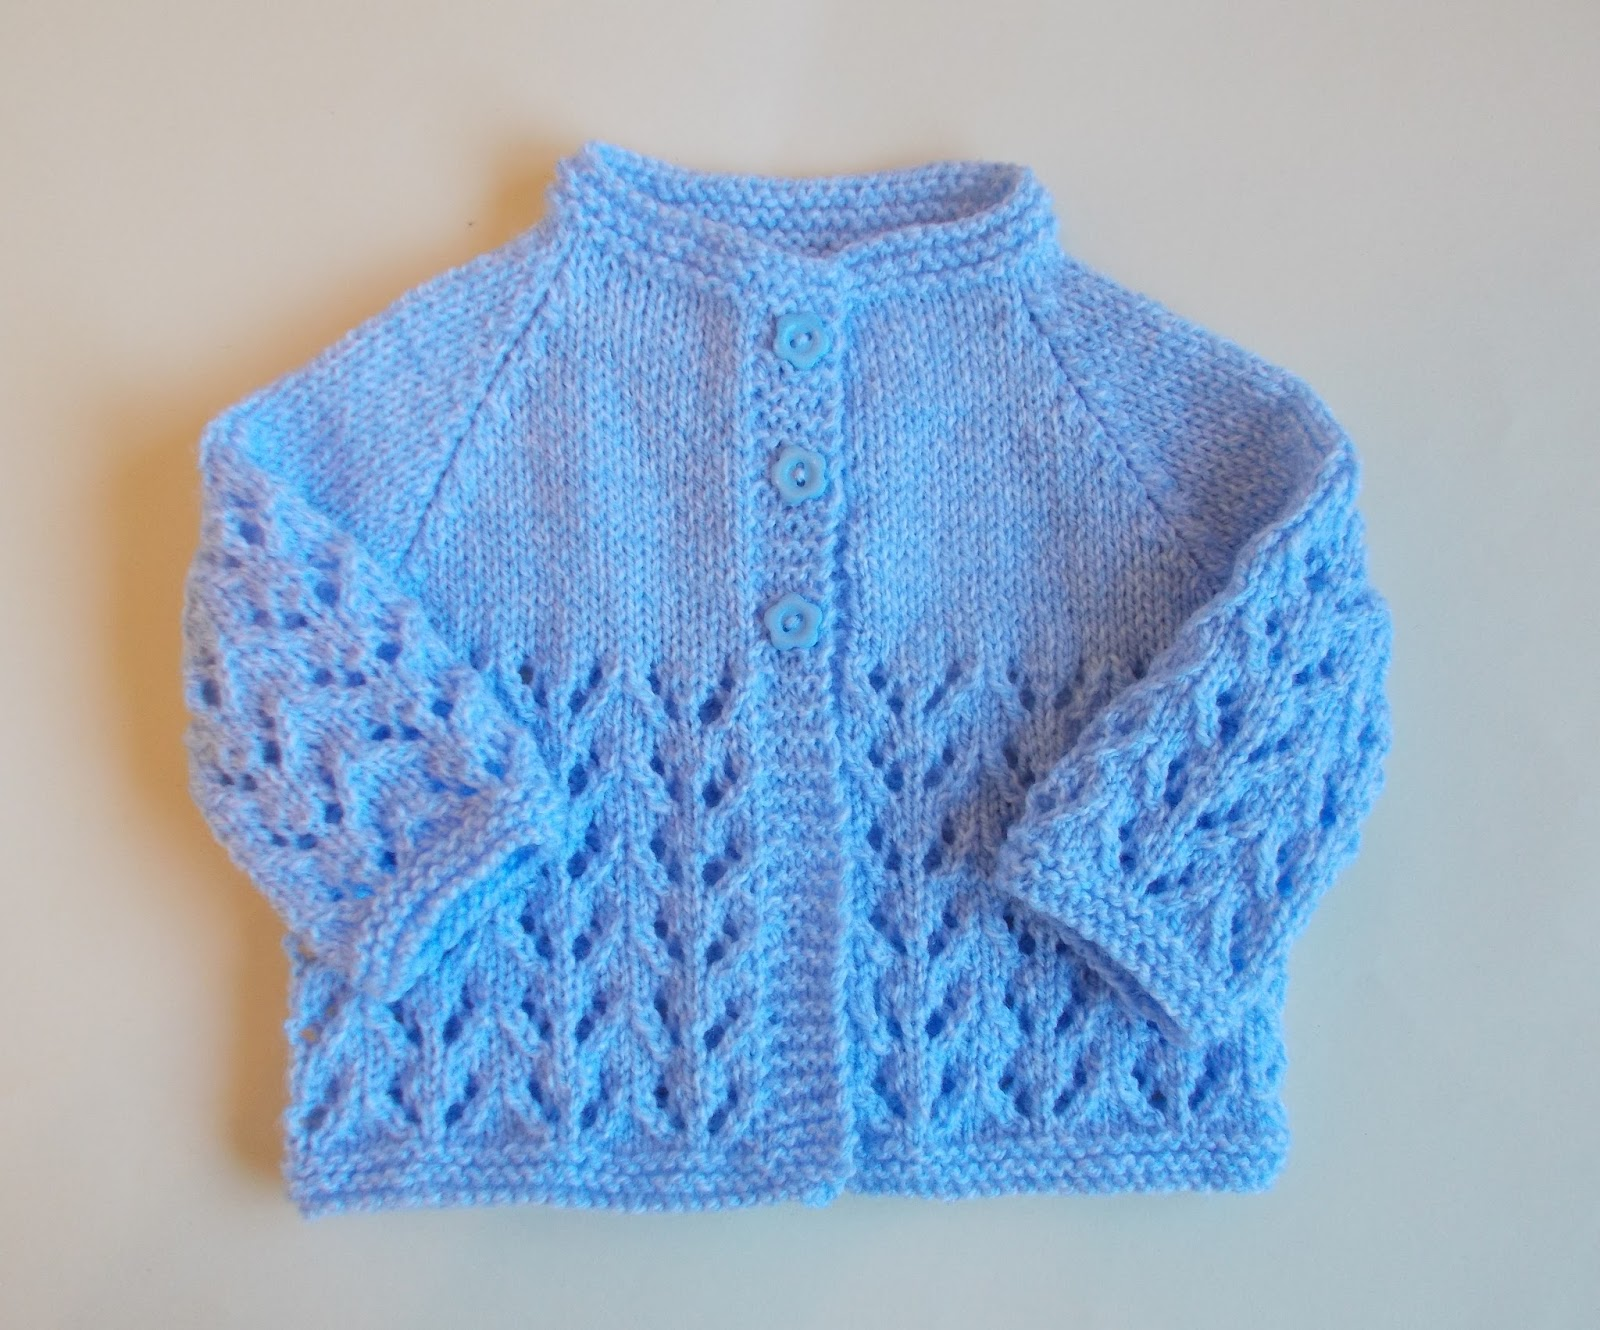 Knitting Pattern Gilet : mariannas lazy daisy days: Bibi - Baby Gilet